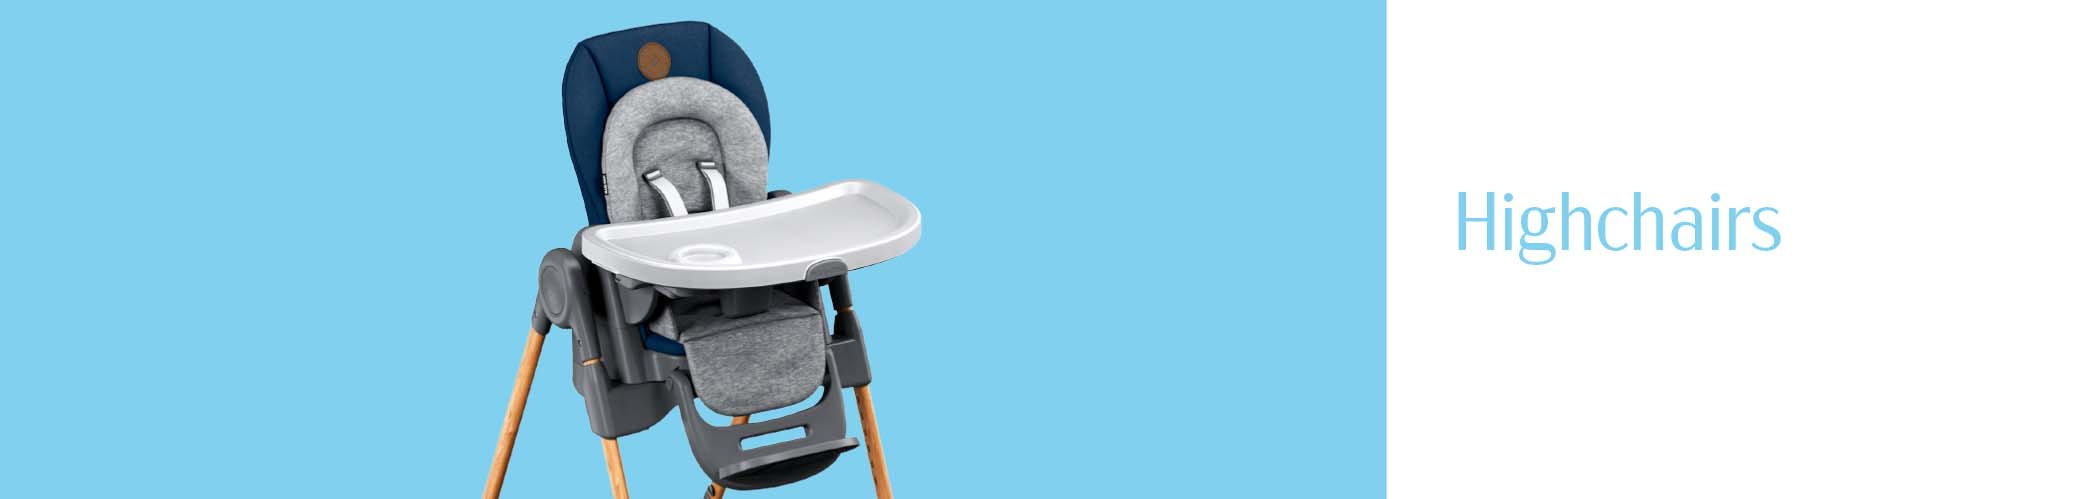 -54-highchairs-internalbanner-may21.jpg